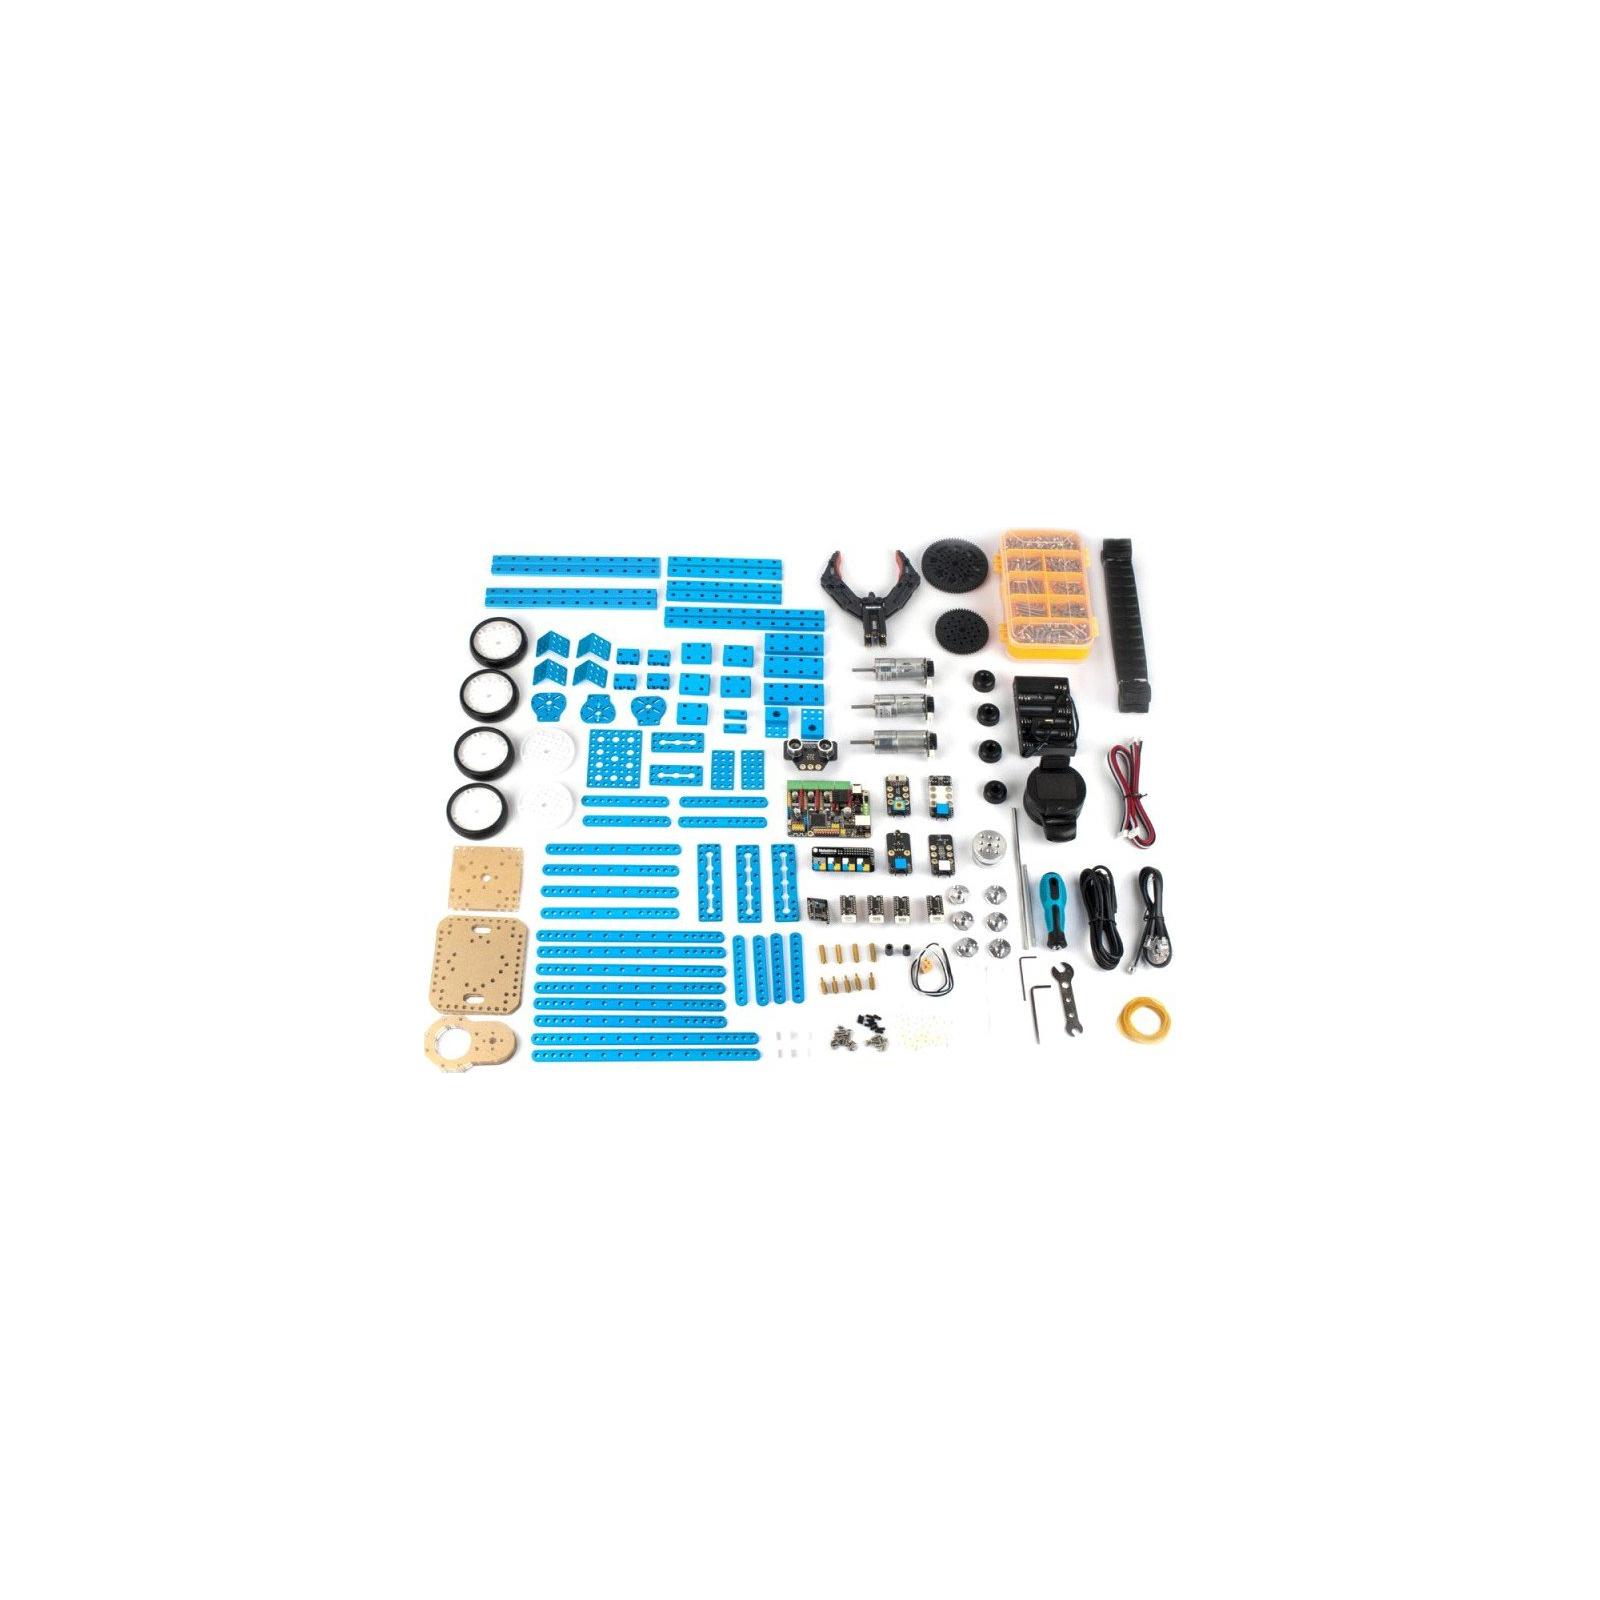 Робот Makeblock Ultimate v2.0 Robot Kit (09.00.40) изображение 12